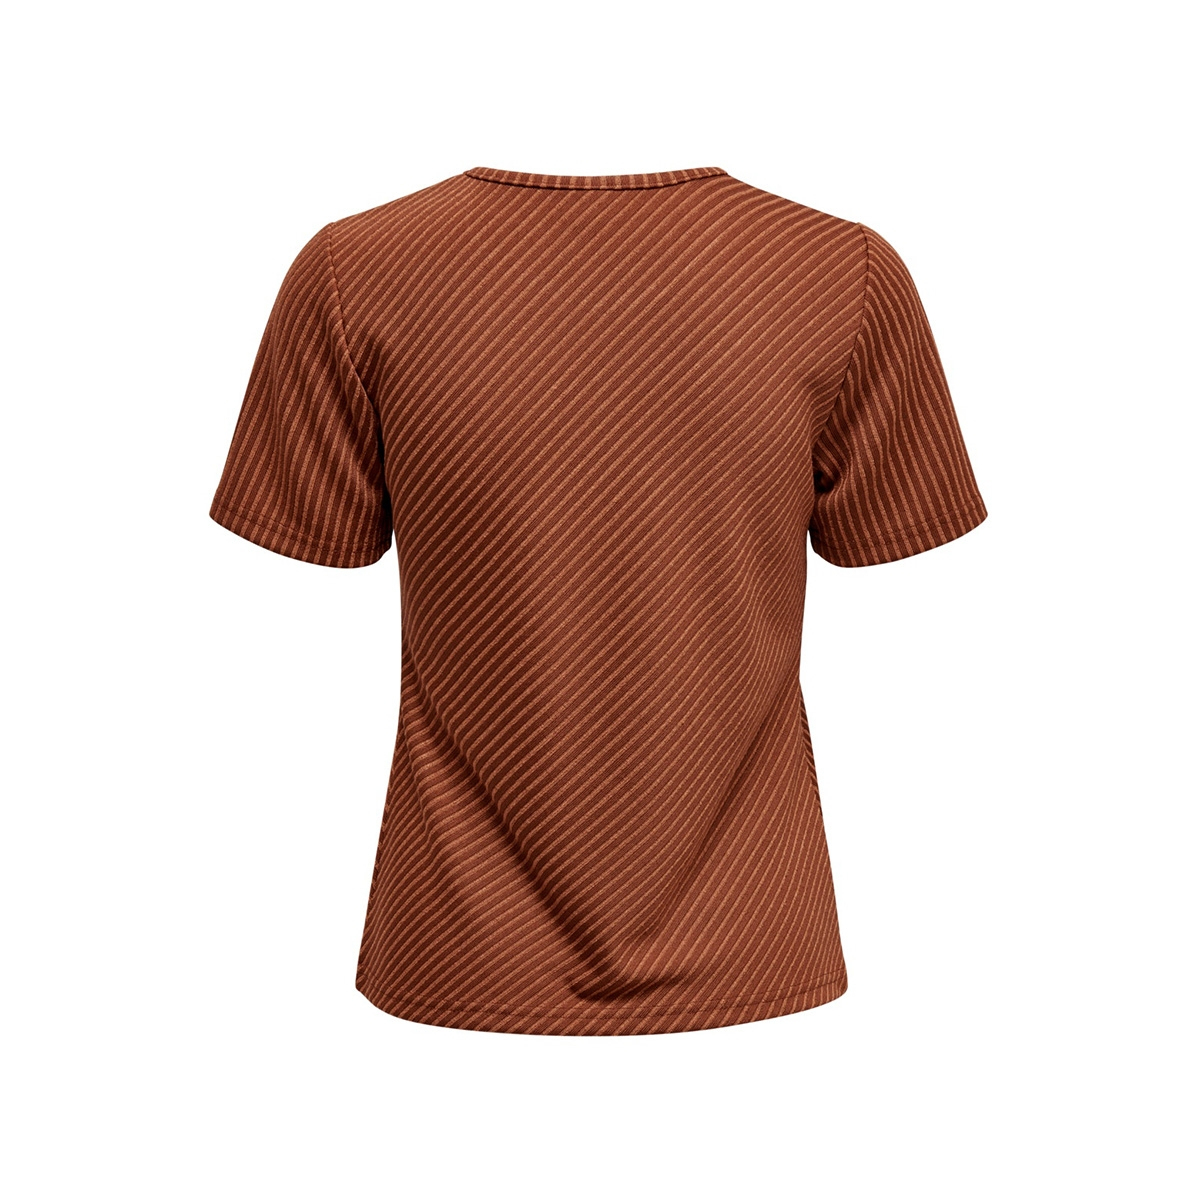 jdytabby s/s striped top jrs exp 15188061 jacqueline de yong t-shirt smoked paprika/autumn leaf